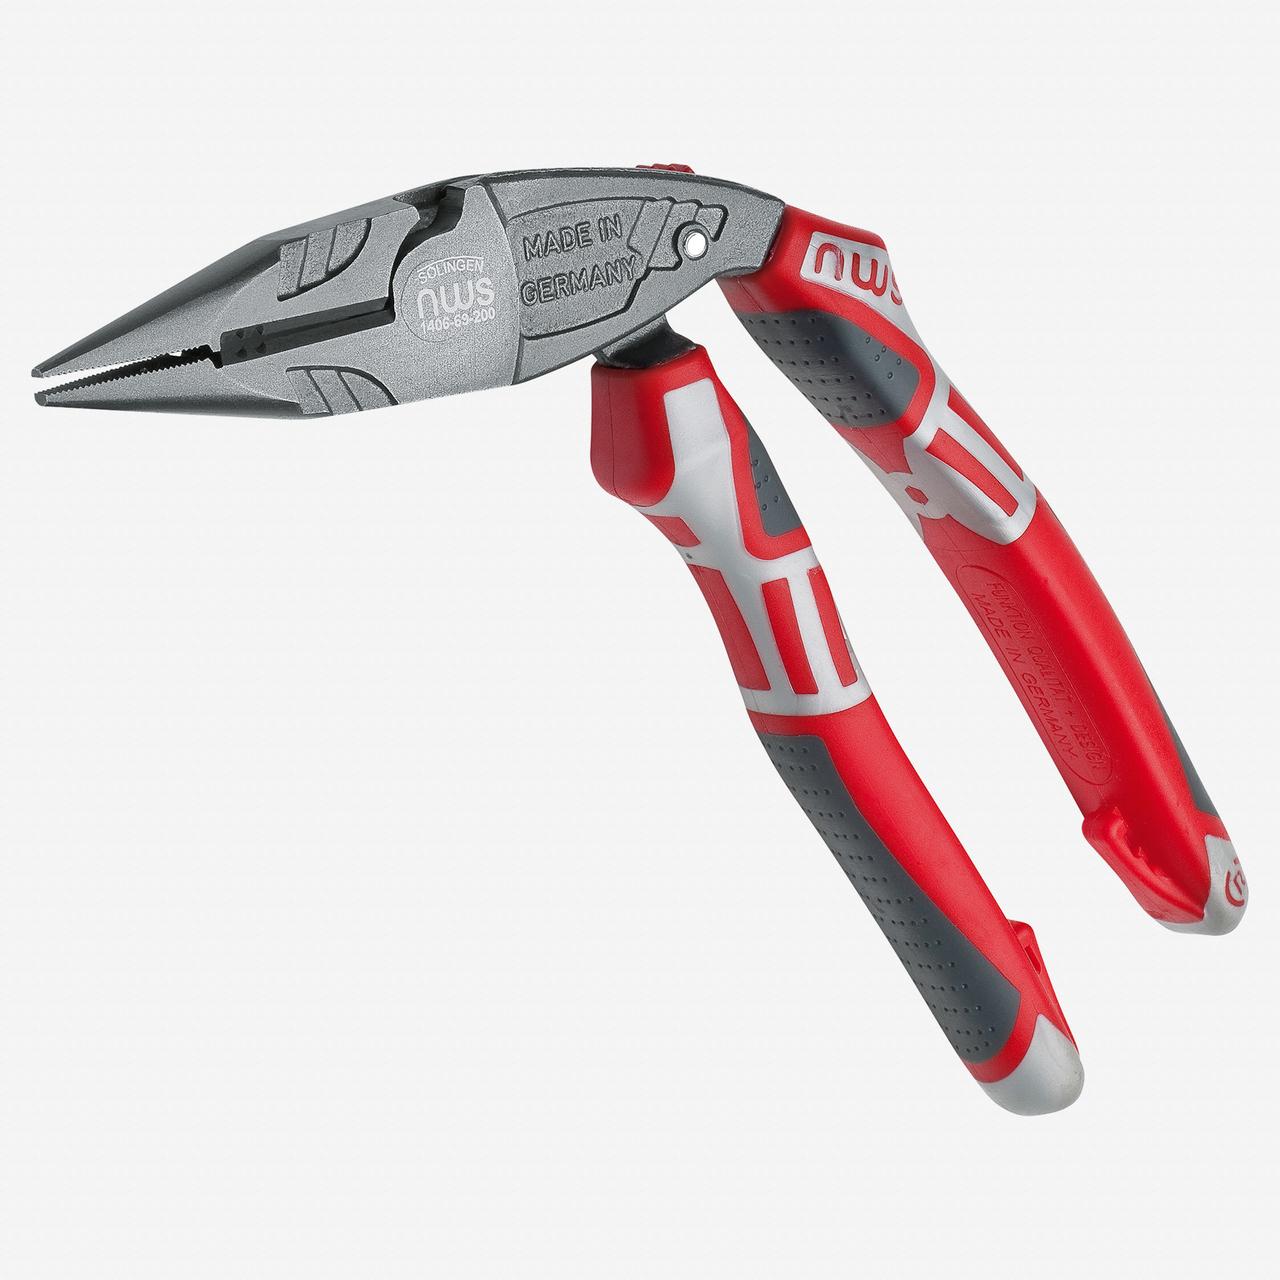 "NWS 1406-69-200 8"" Ergonomical Electrician's Pliers ErgoMulti - TitanFinish - SoftGripp - KC Tool"